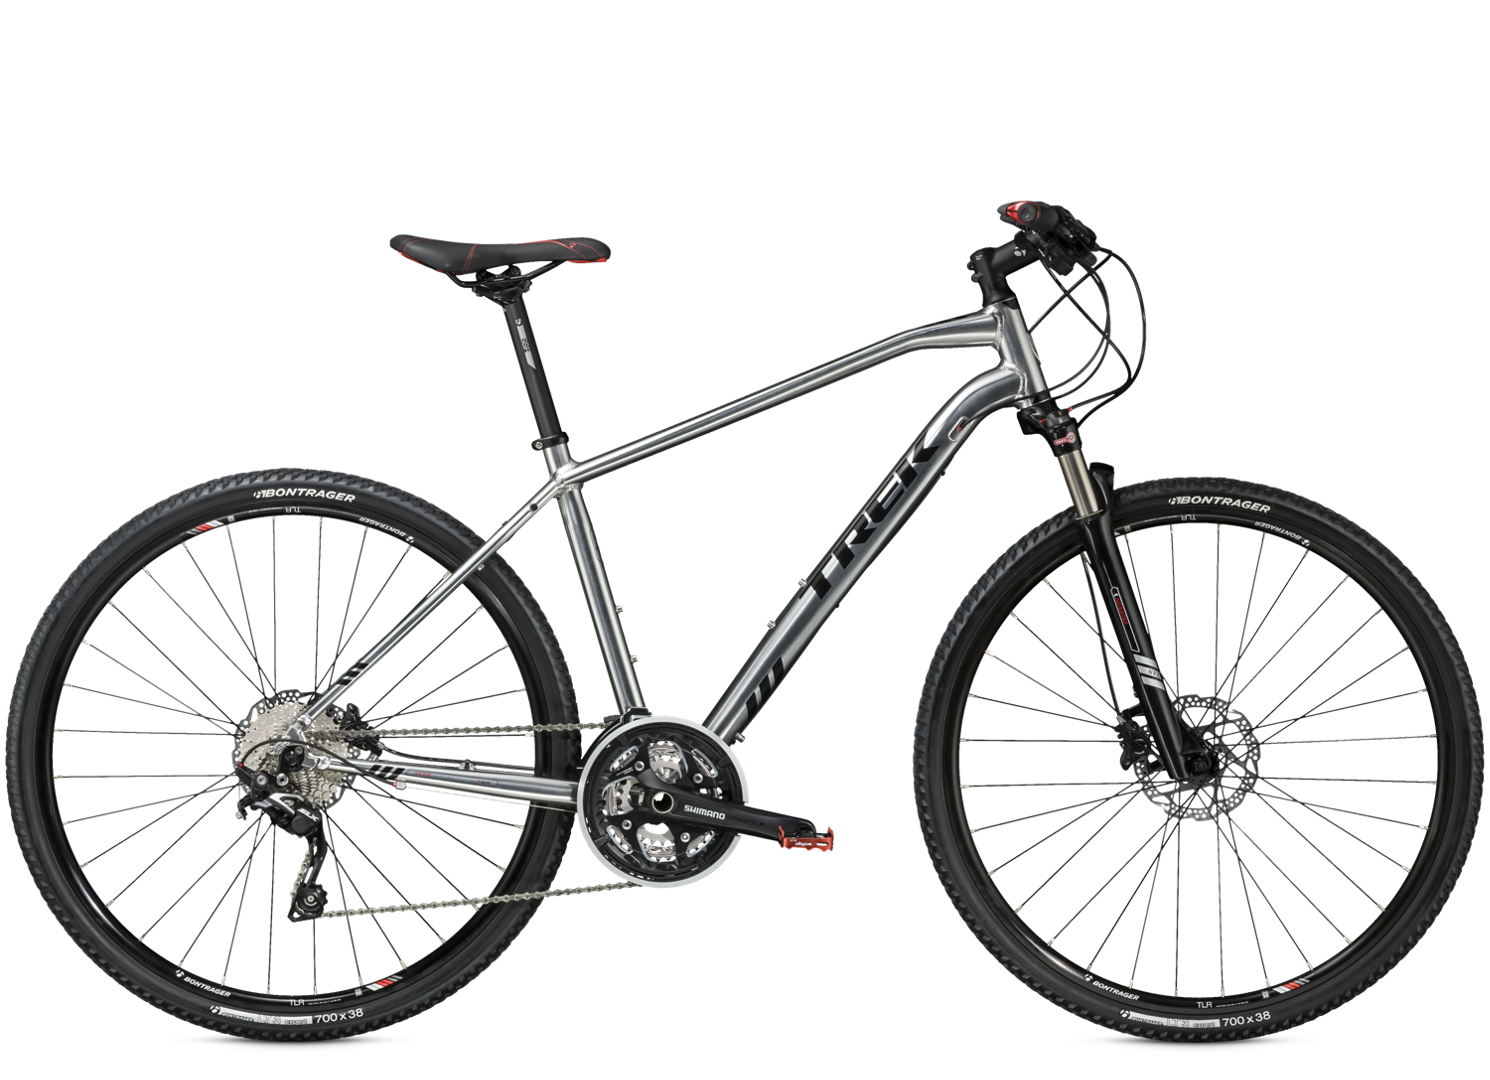 8.6 DS Trek Bicicletas trek, Bicicletas haro